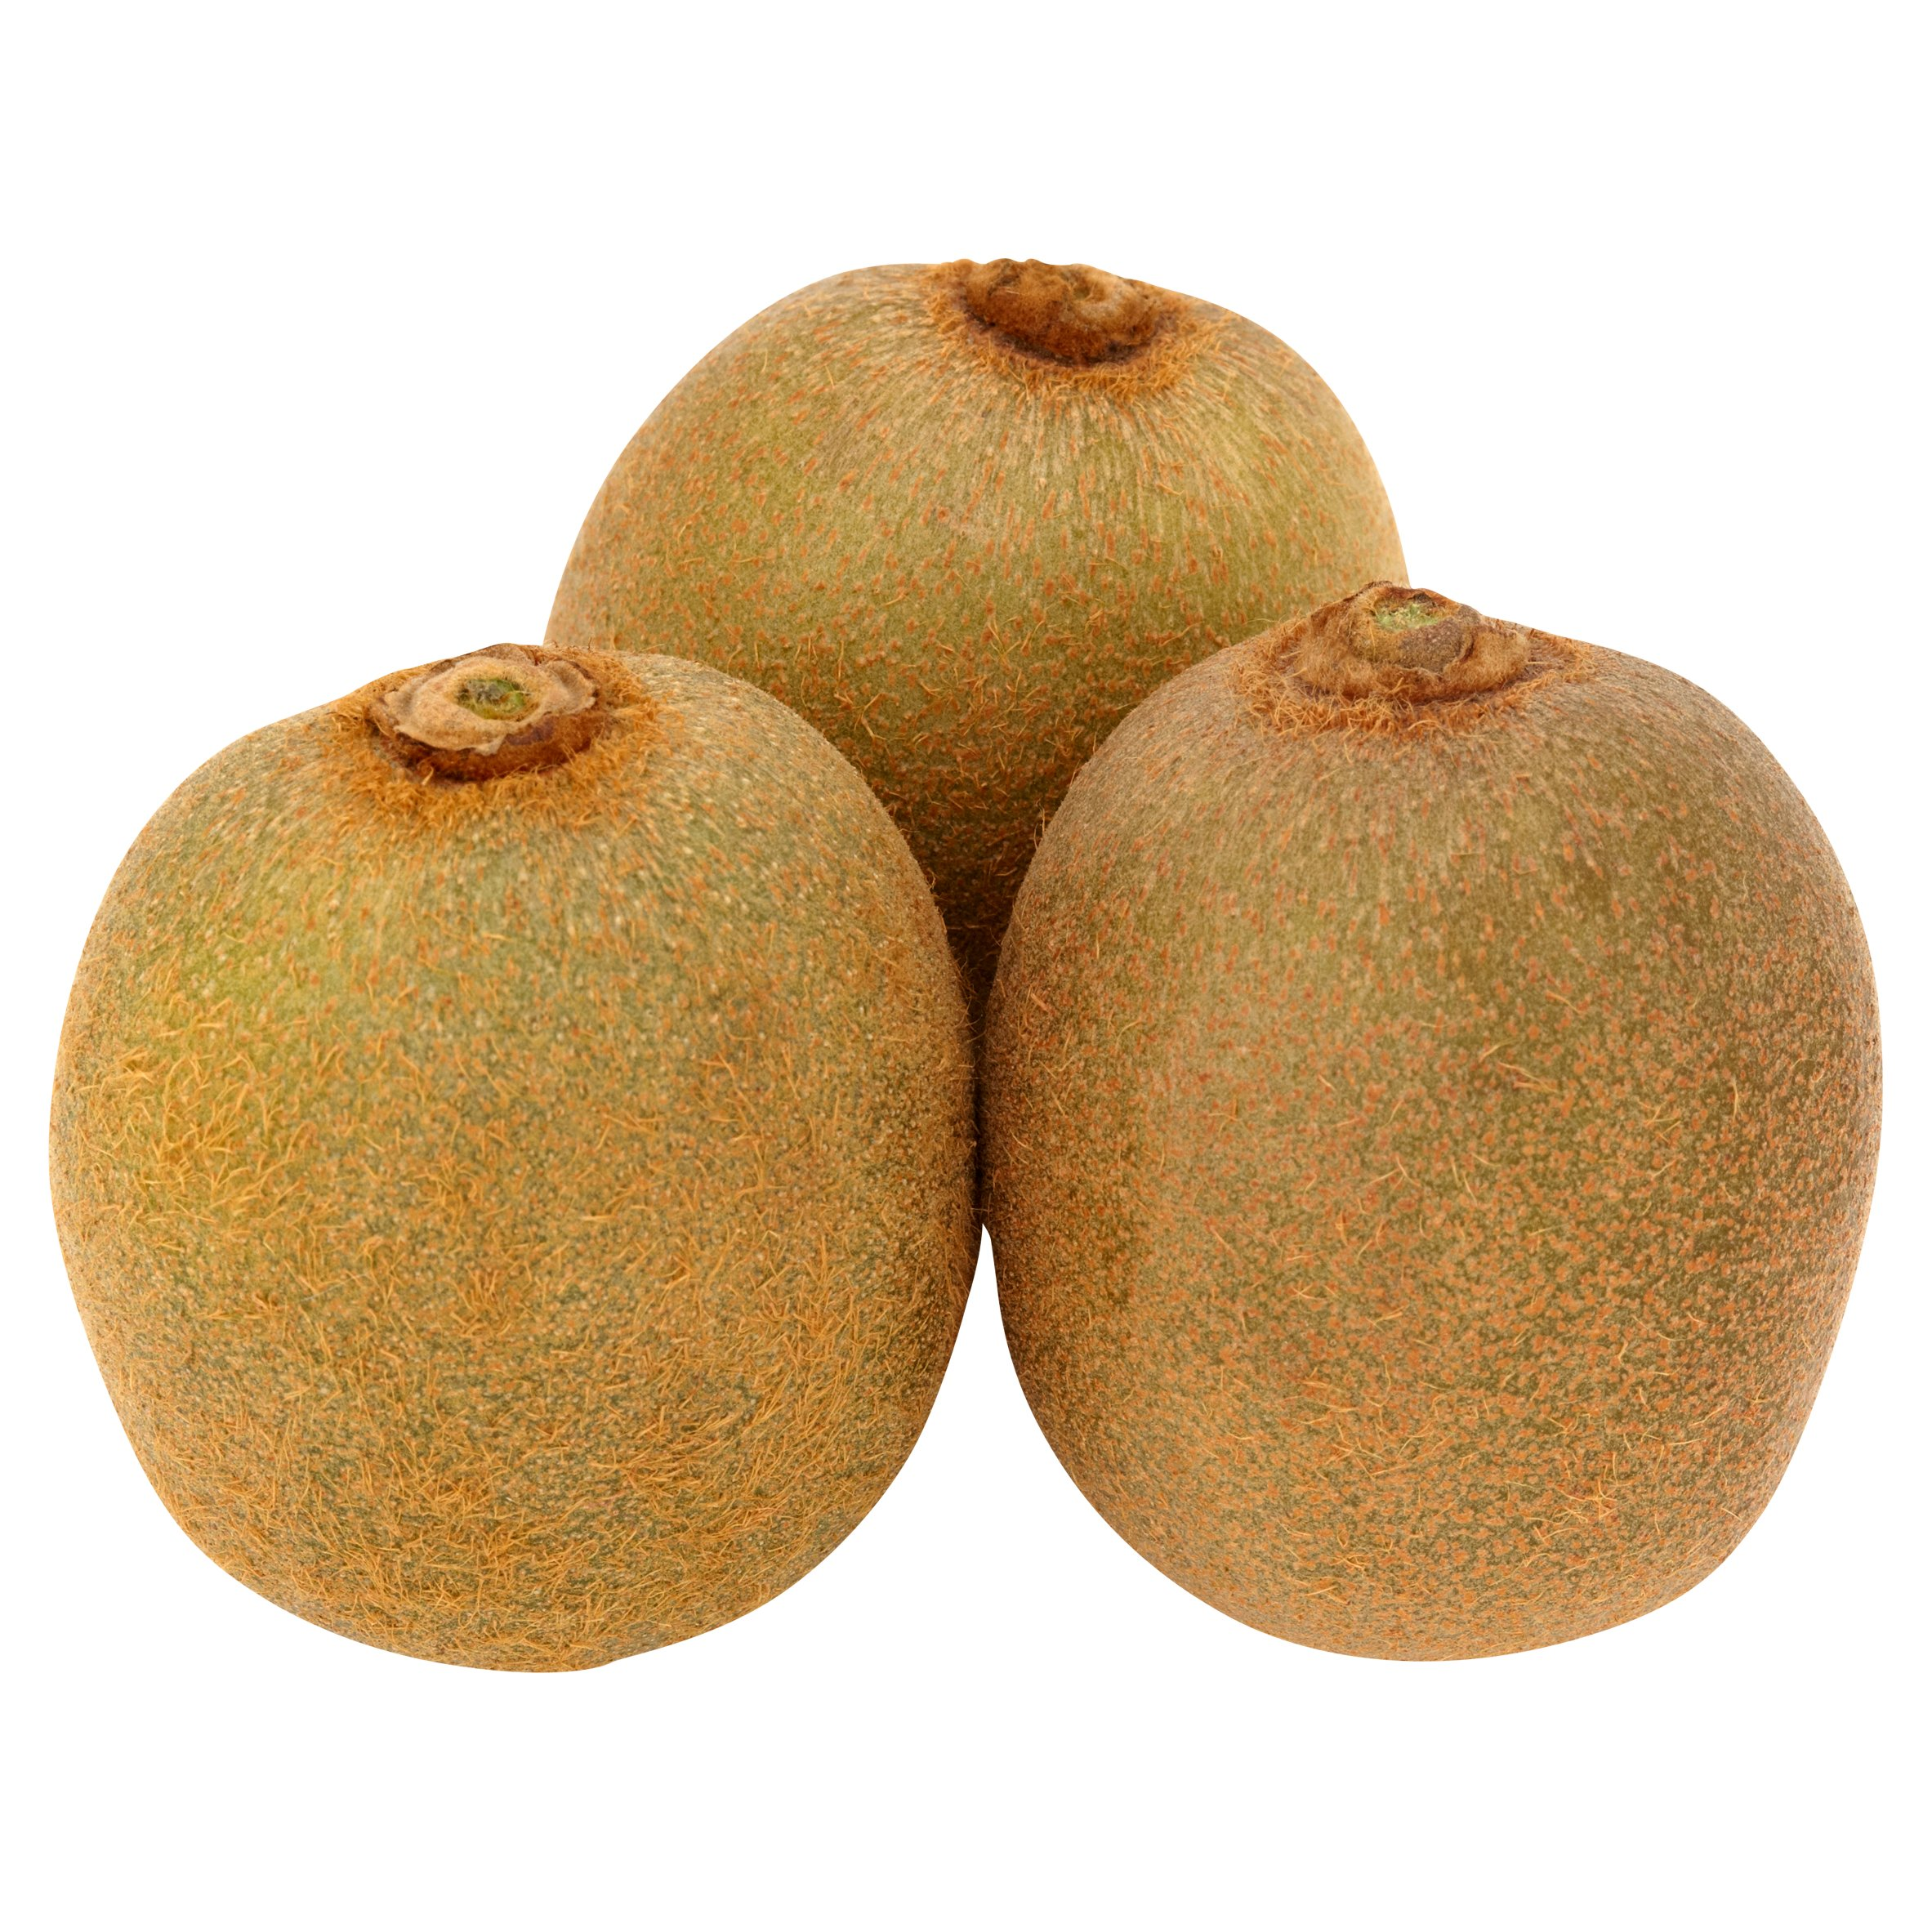 TESCO > Fresh Food > Large Kiwi Fruit Class 1 Each